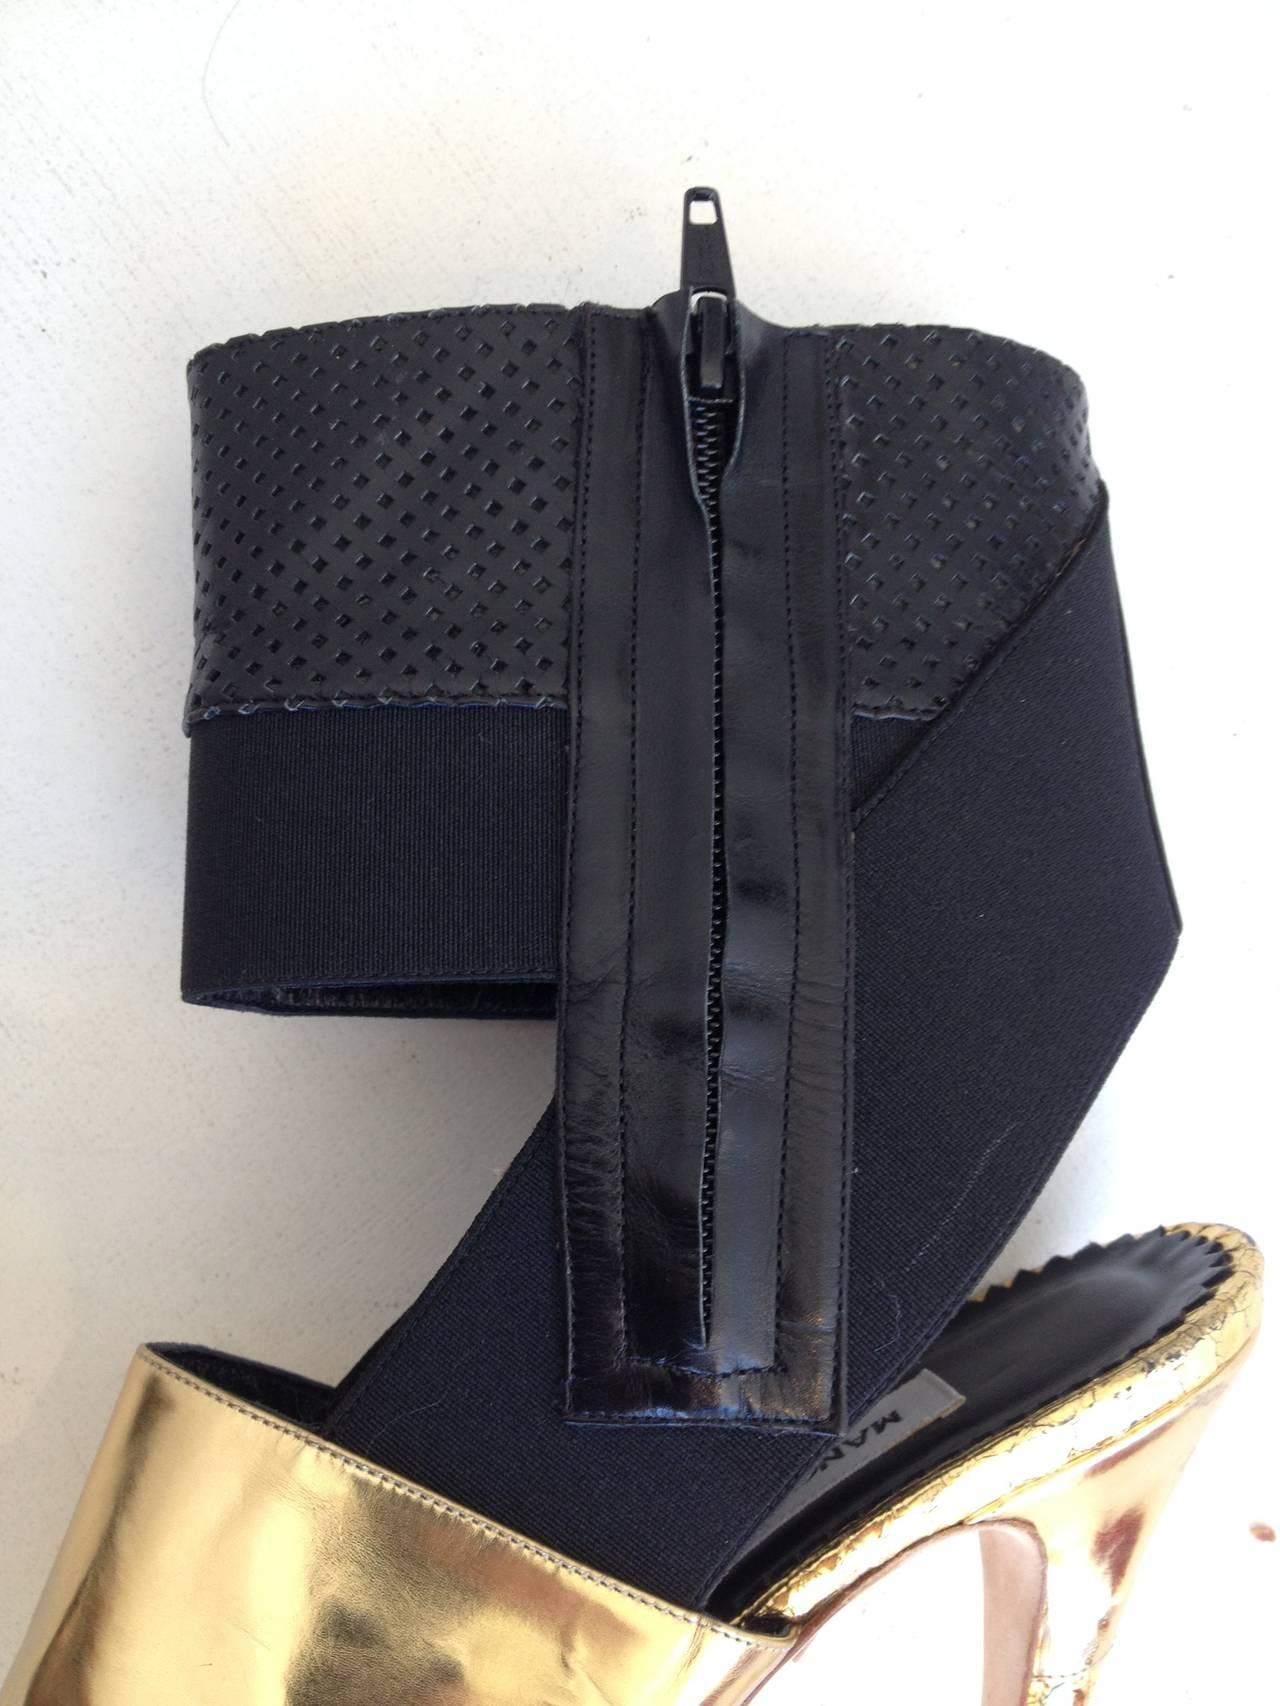 Manolo Blahnik Black and Gold Metallic Heels 4